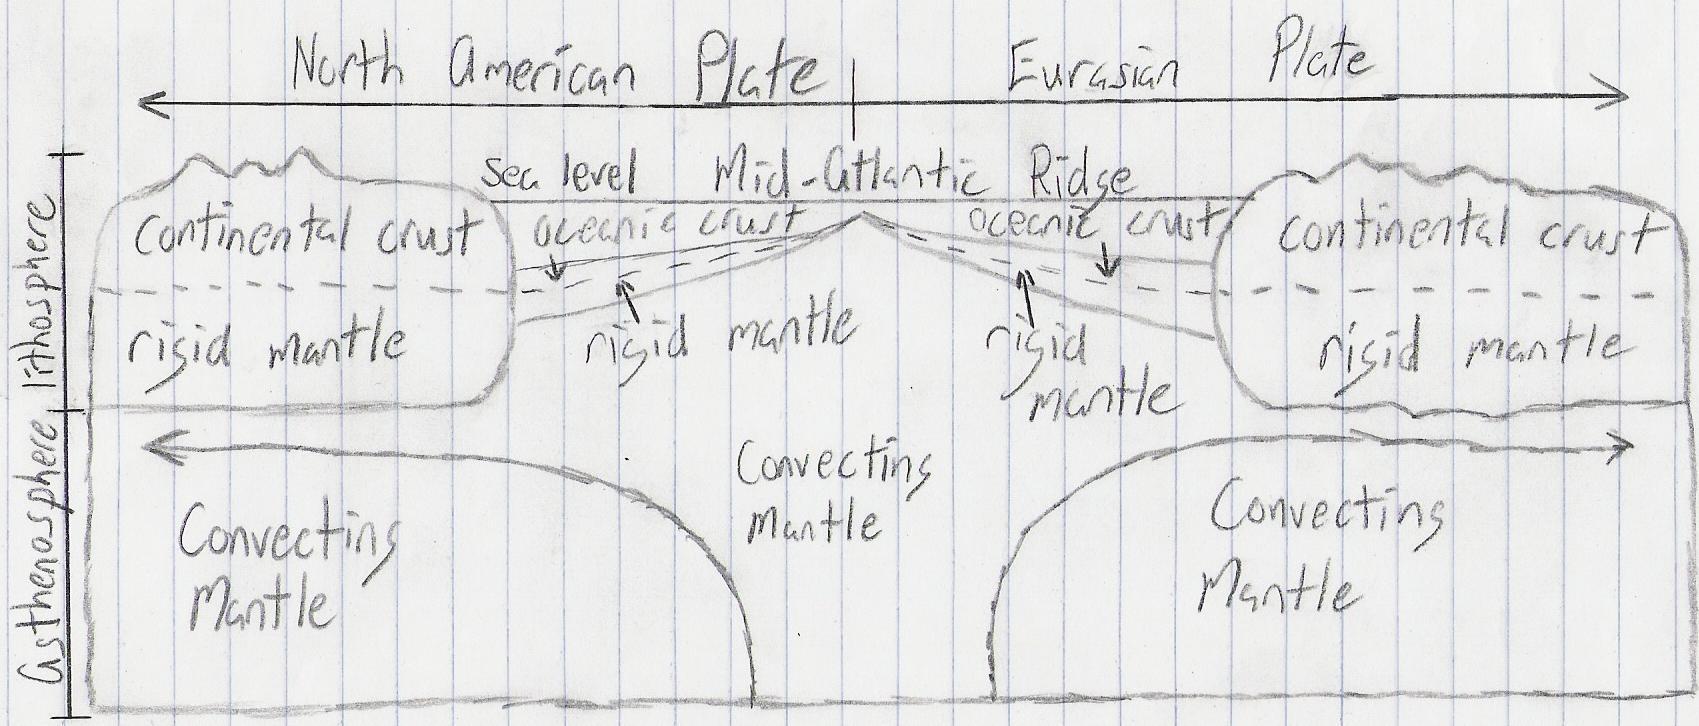 mid atlantic ridge plate boundary